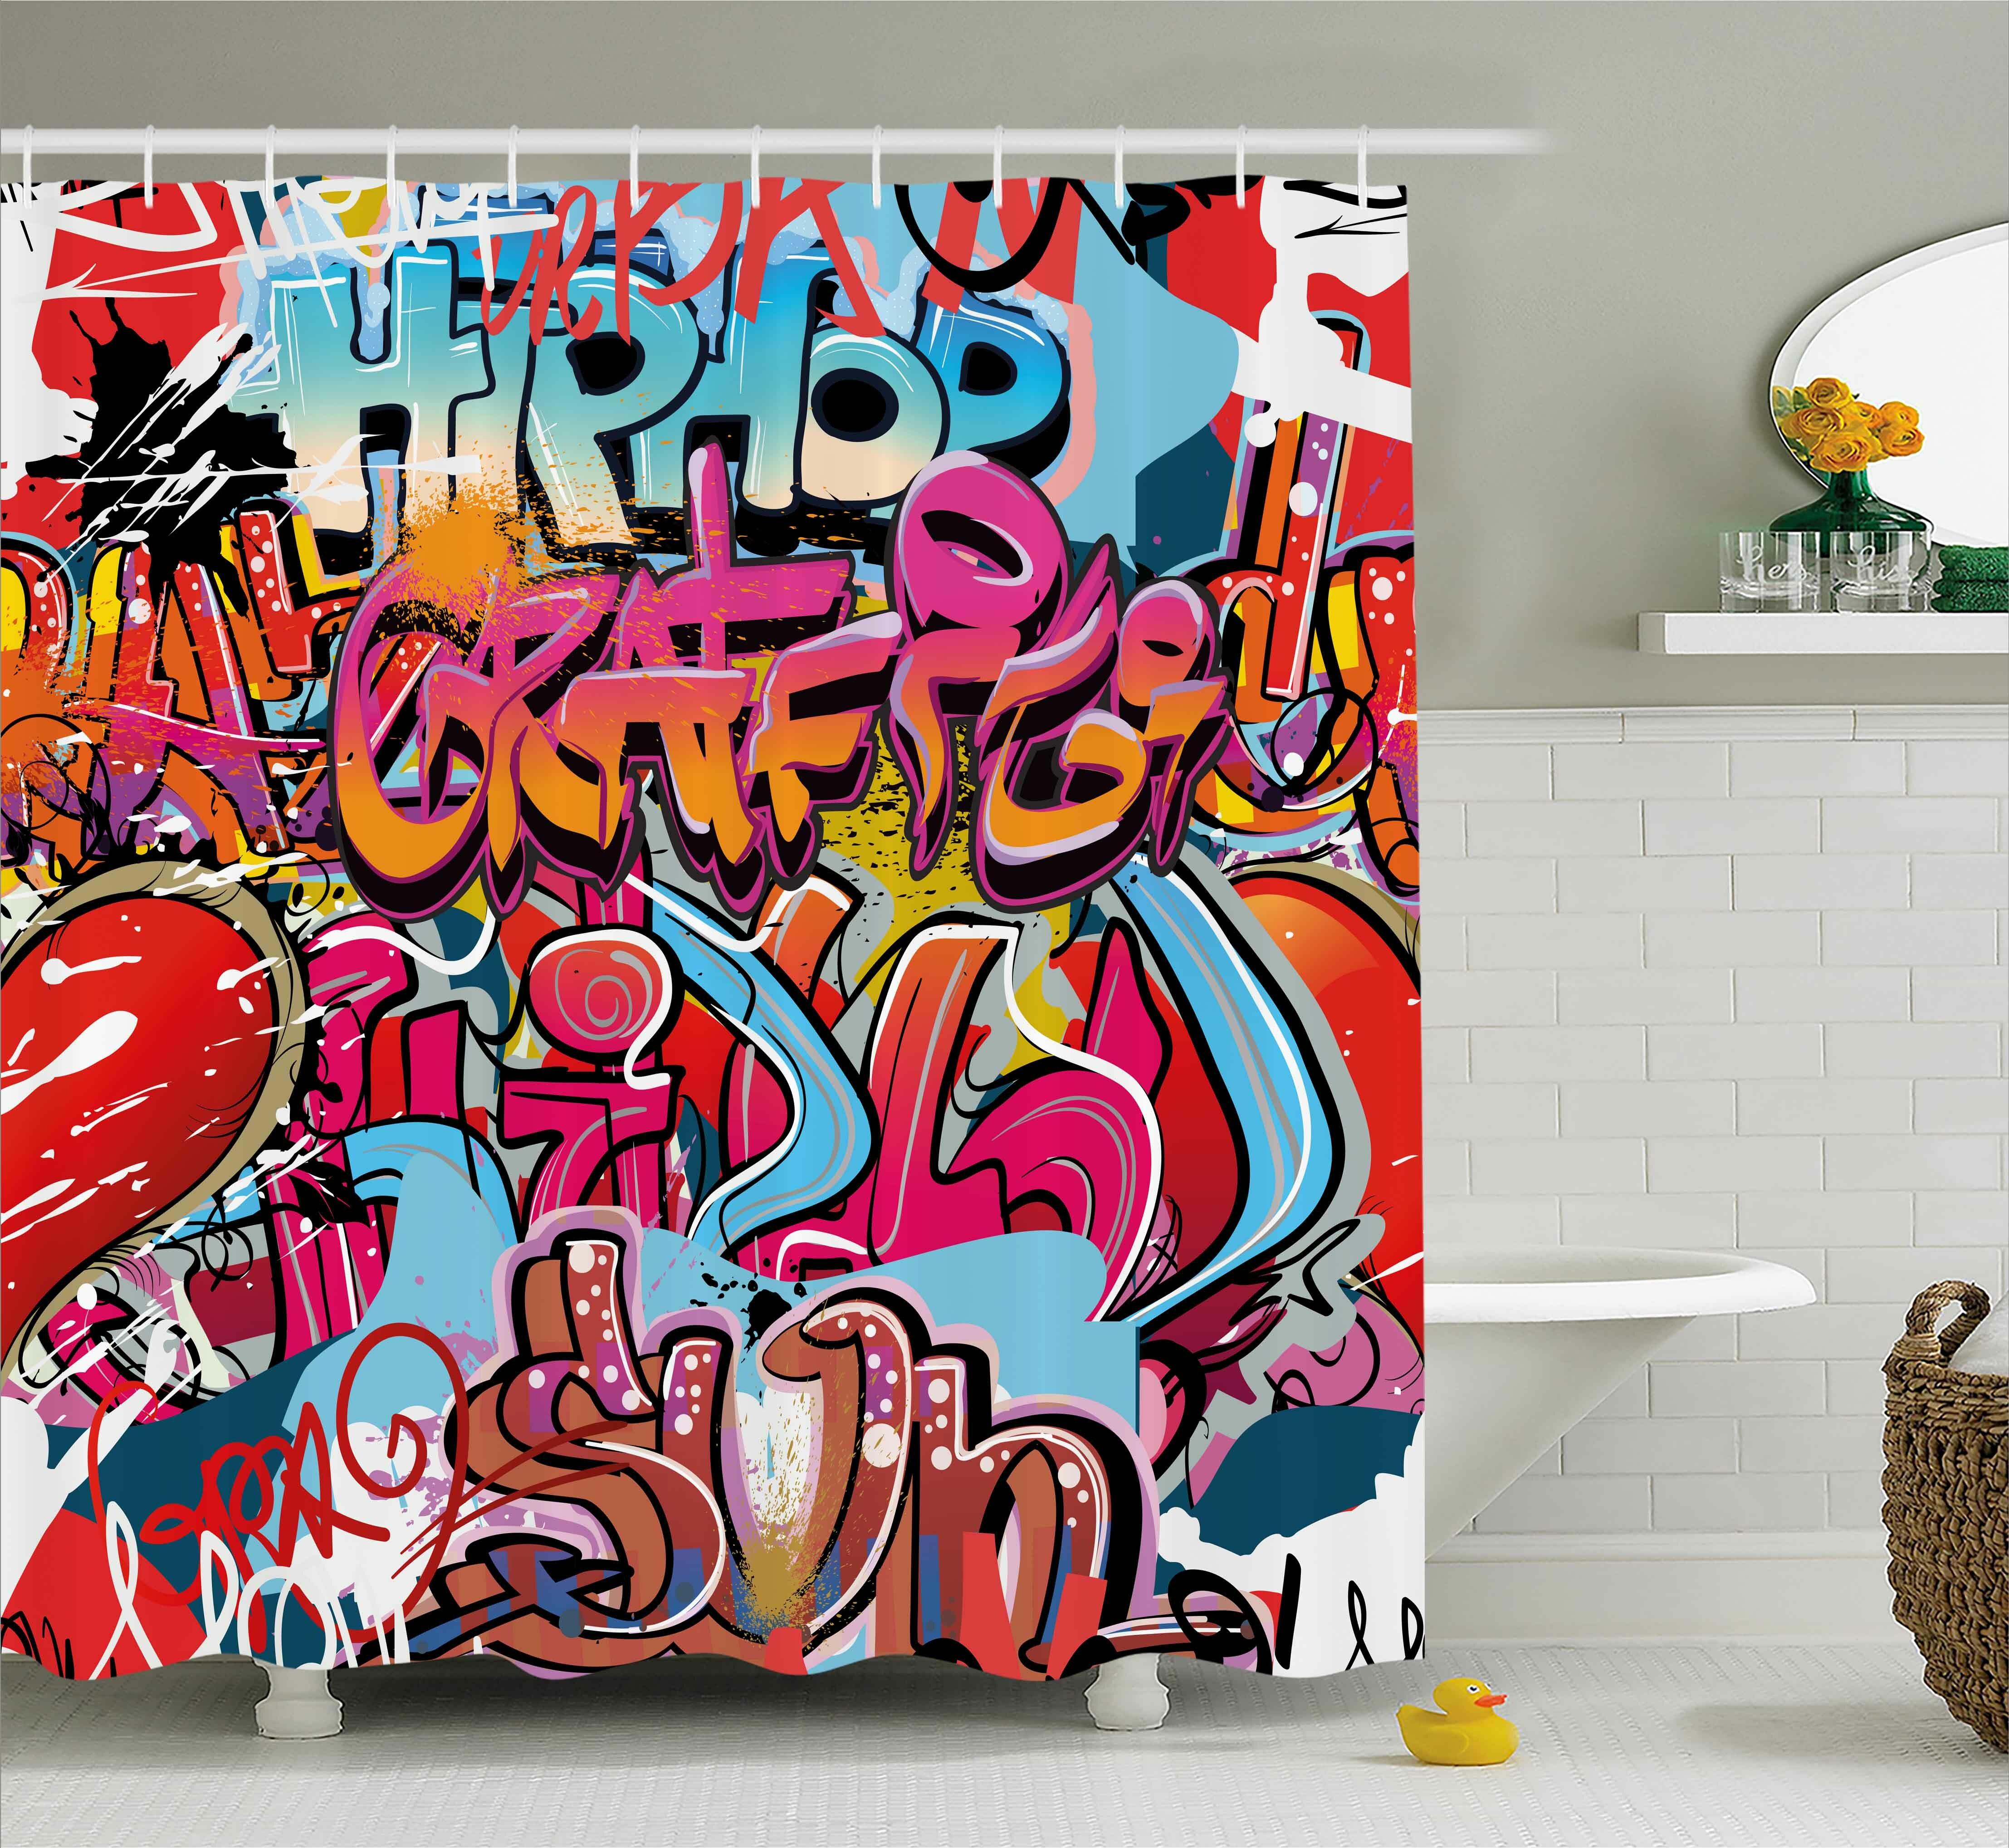 Ebern Designs Zia Graphic Hip Hop Street Culture Harlem